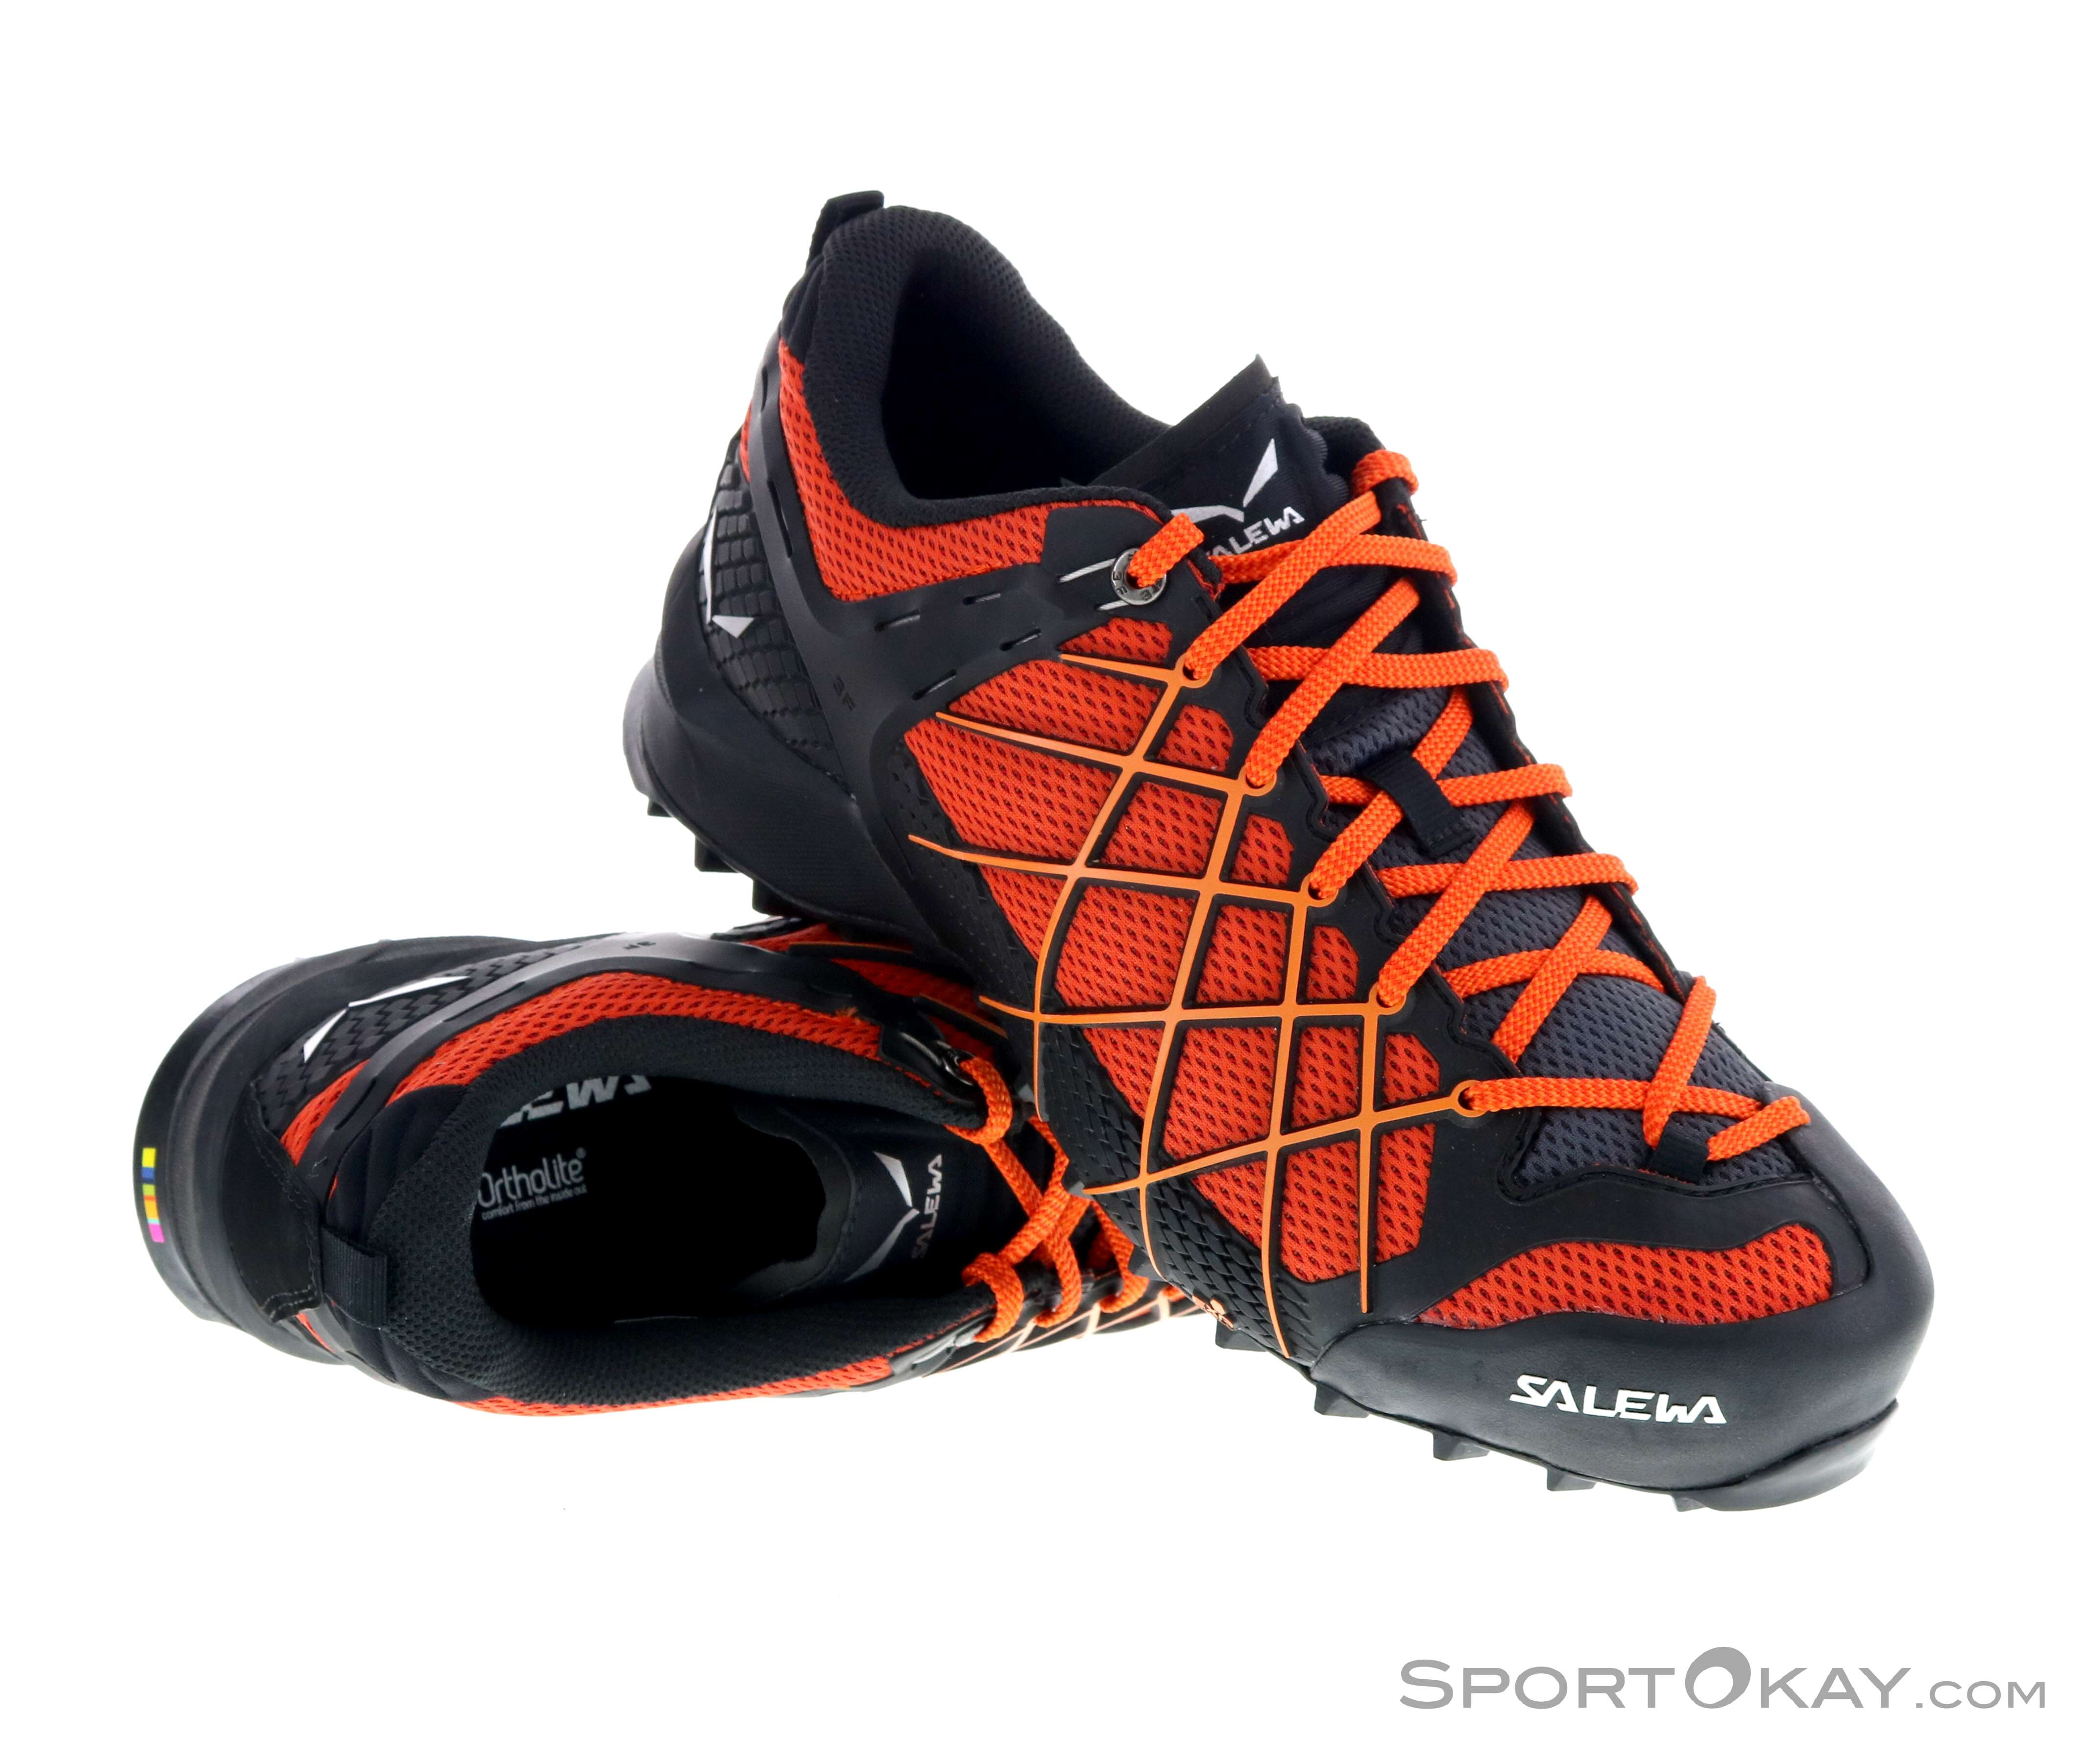 size 40 9f91e 68745 Salewa Salewa Wildfire Mens Approach Shoes